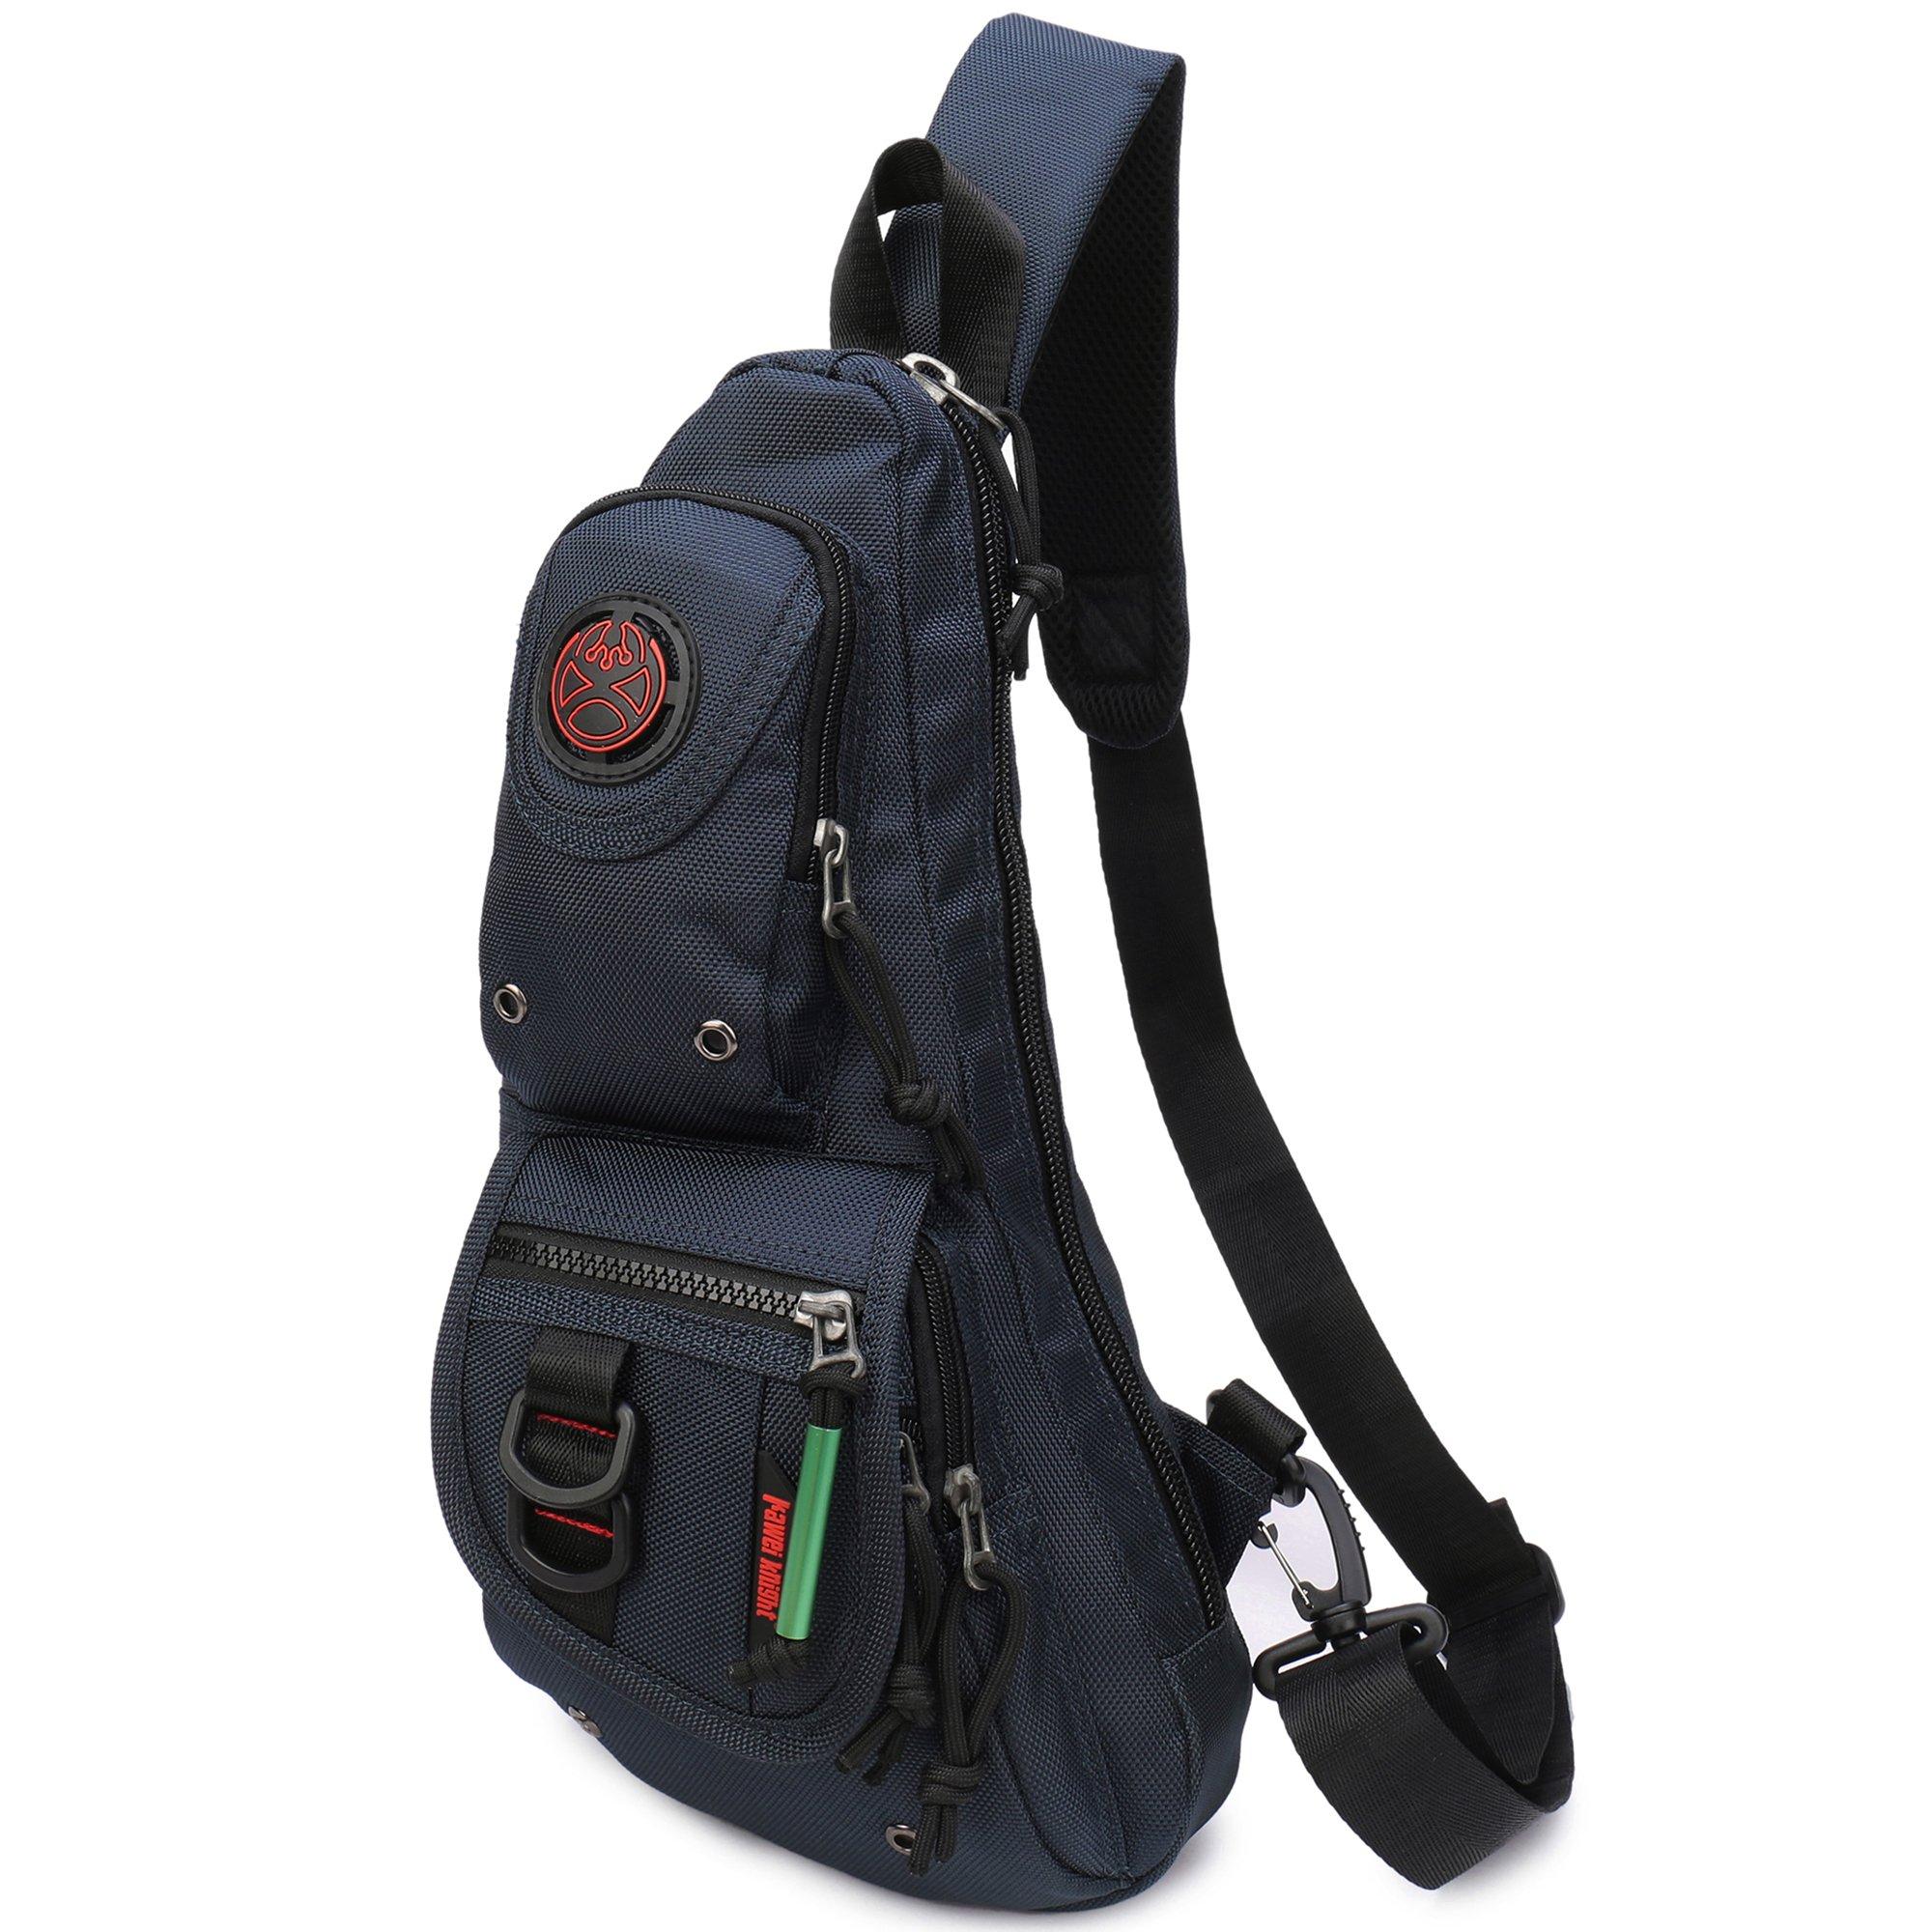 Sling Backpacks, Sling Chest Bags Shoulder Fanny Pack Crossbody Bags for Men Women Outdoor Travel Walking Dog Running (Navy blue)